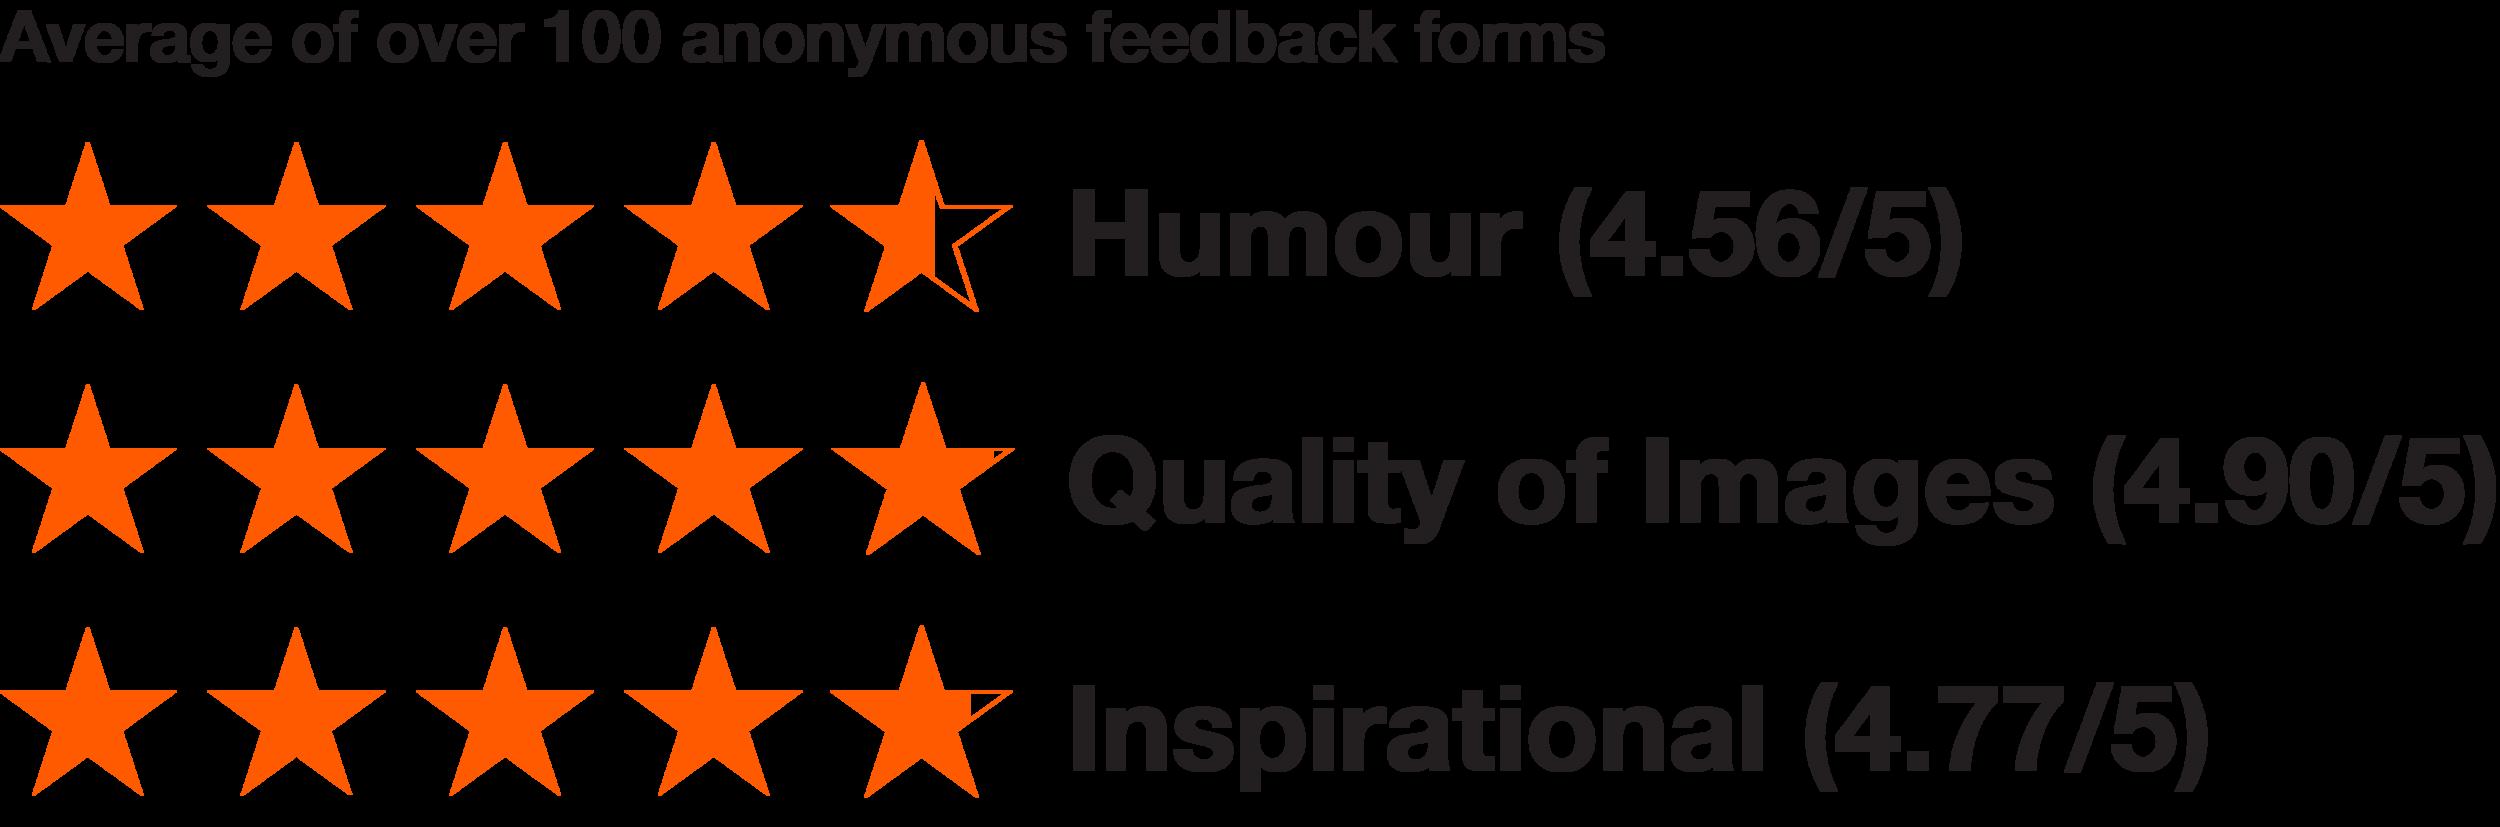 Feedback stars 03-2017 black & orange.png